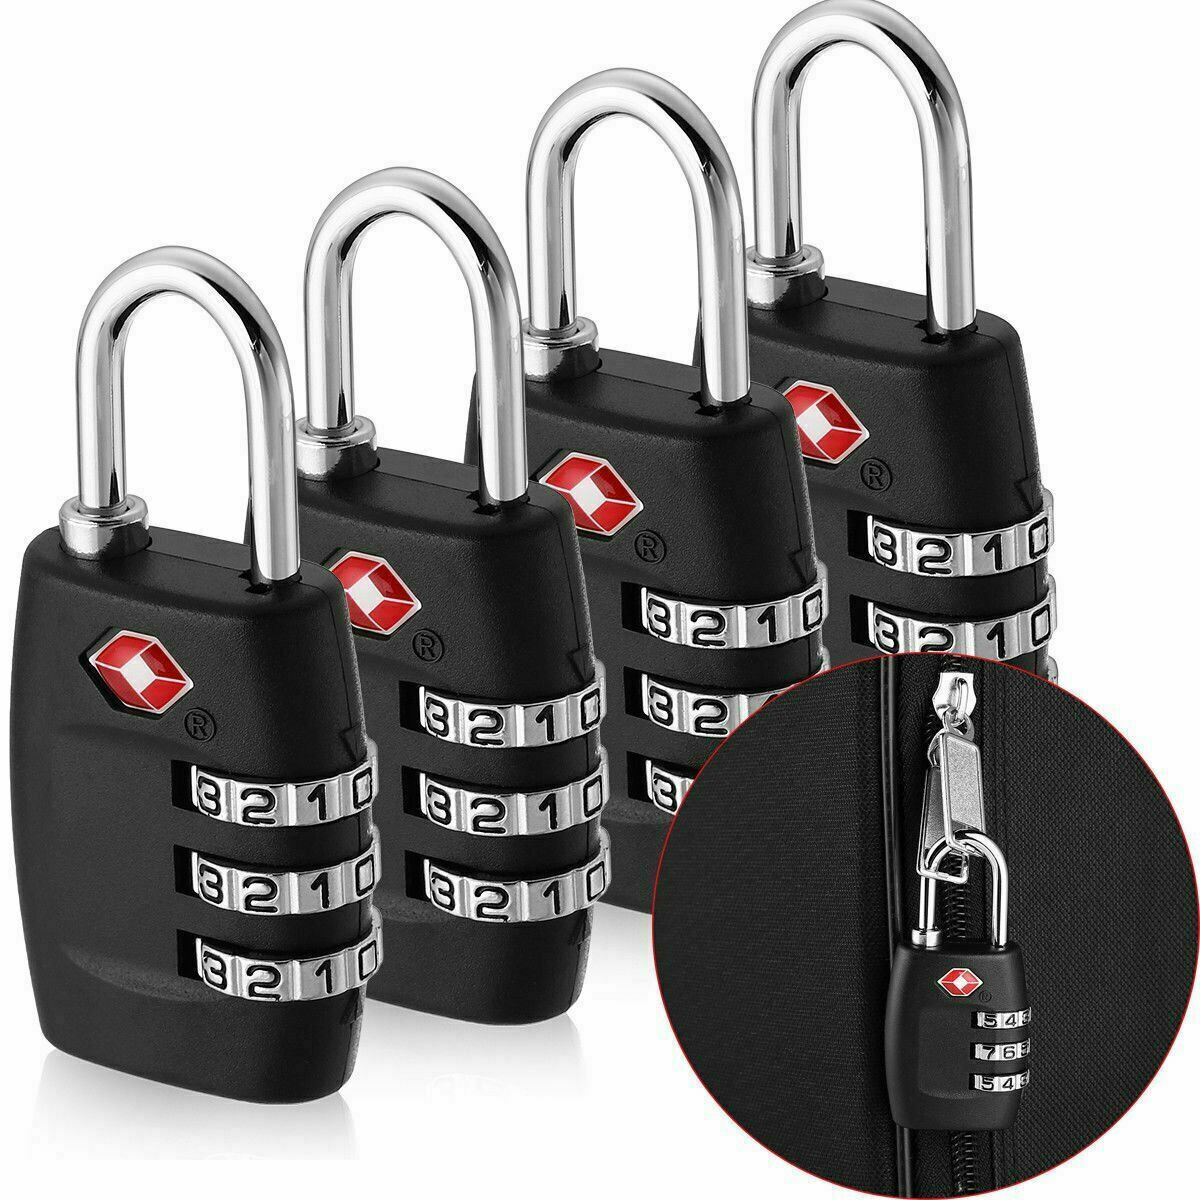 4x TSA Approved Luggage Lock Travel 3 Digit Combination Suitcase Padlock Reset Locks